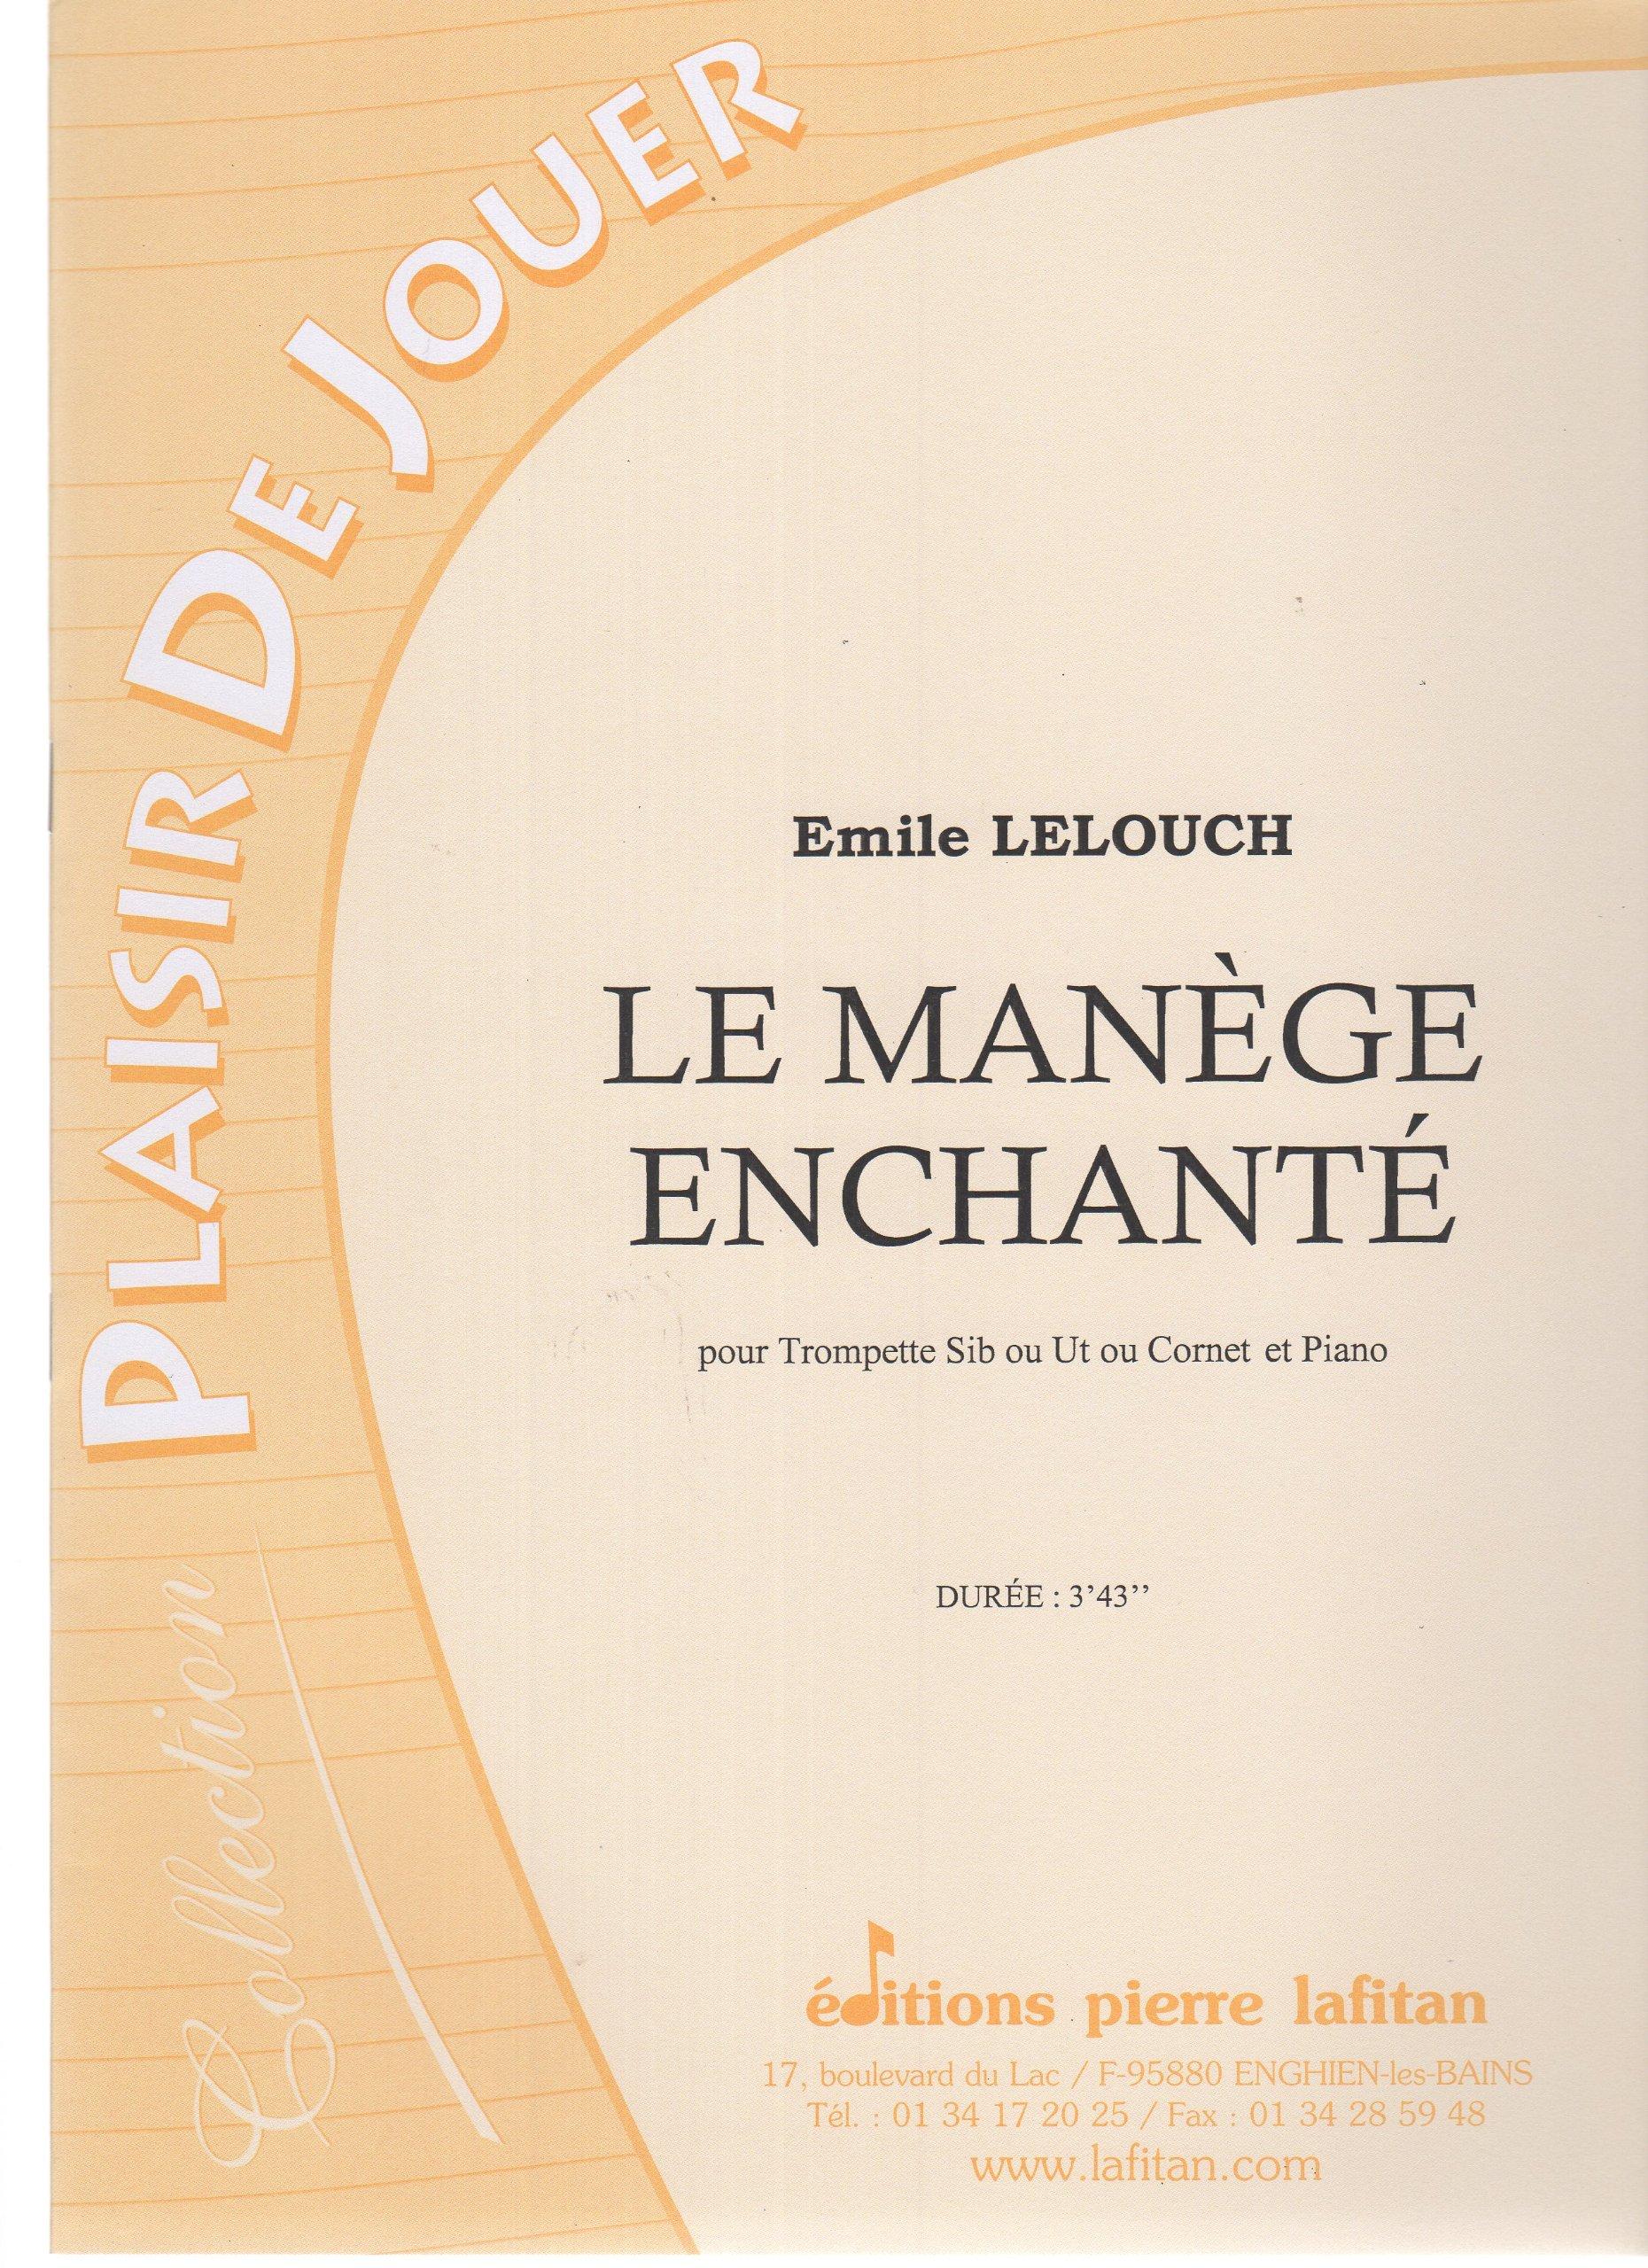 Le-manege-enchante-pour-Trompette-Si-b-ou-ut-ou-Cornet-et-Piano